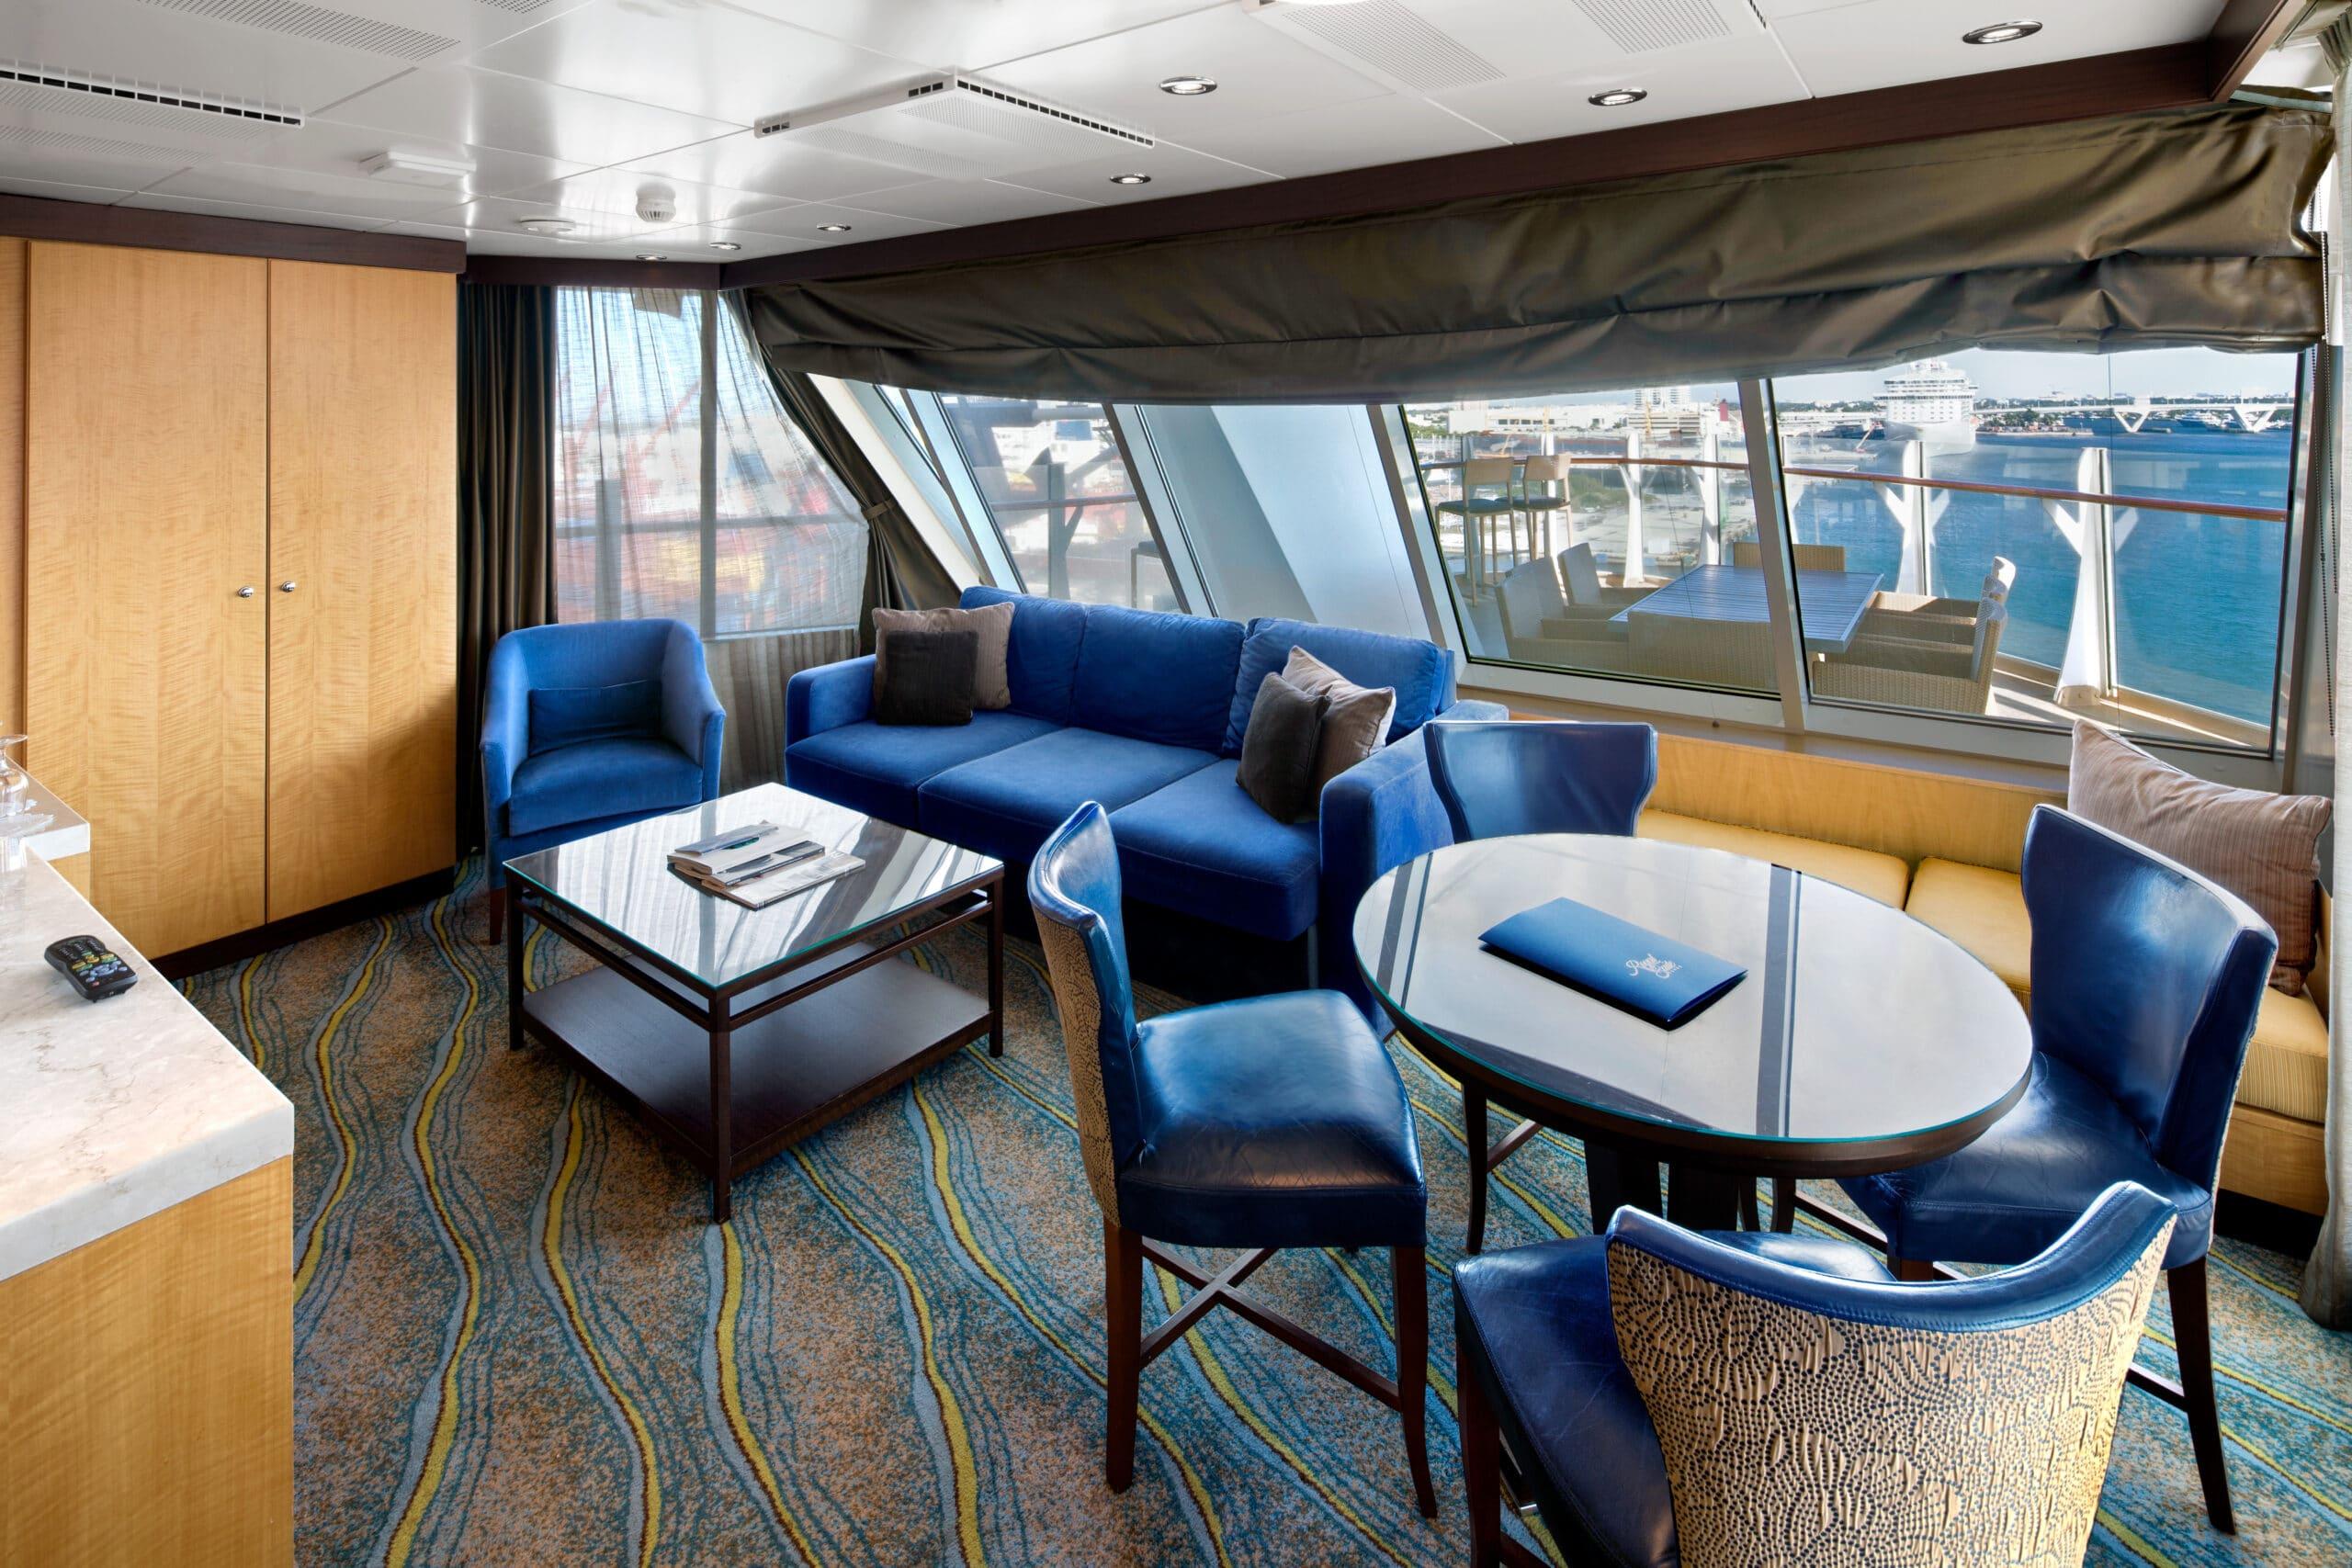 Royal-Caribbean-International-Allure-of-the-Seas-Oasis-of-the-seas-schip-cruiseschip-categorie-A2-Aqua-theather-met-2-slaapkamers-